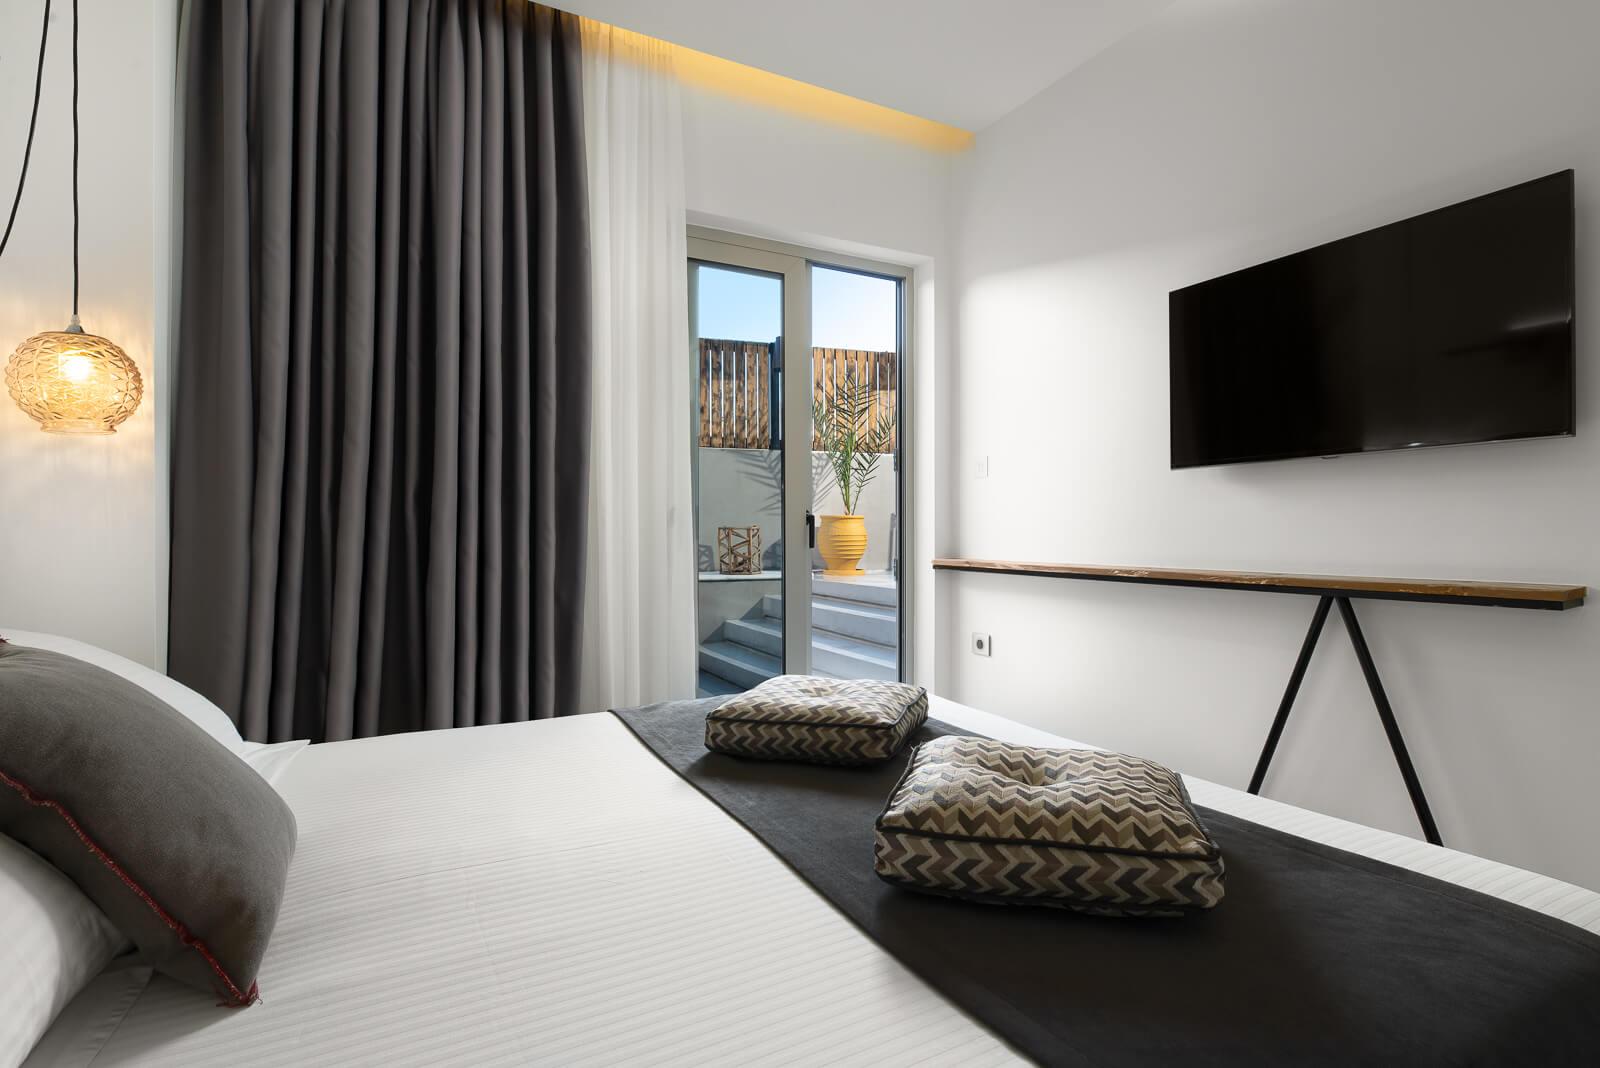 Iviskos Themed Suite - Elakati Hotel in Rhodes Greece